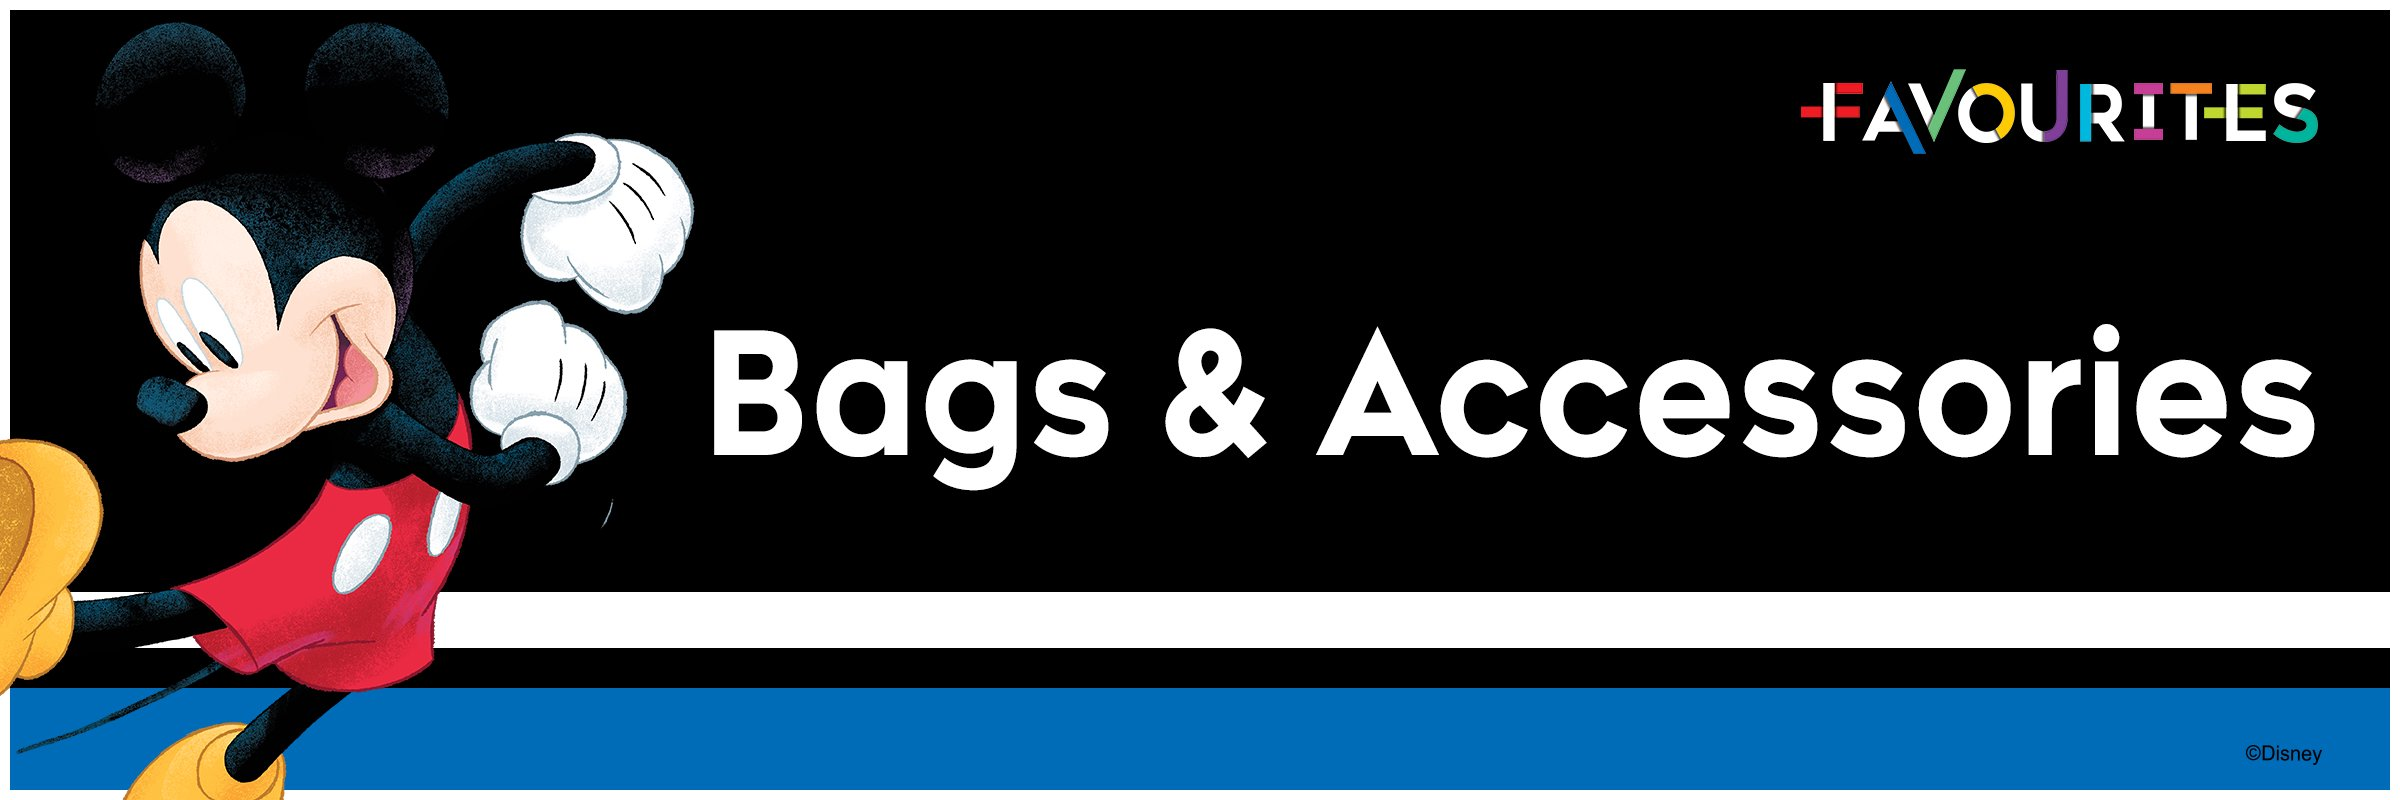 Disney - Bags & Accessories